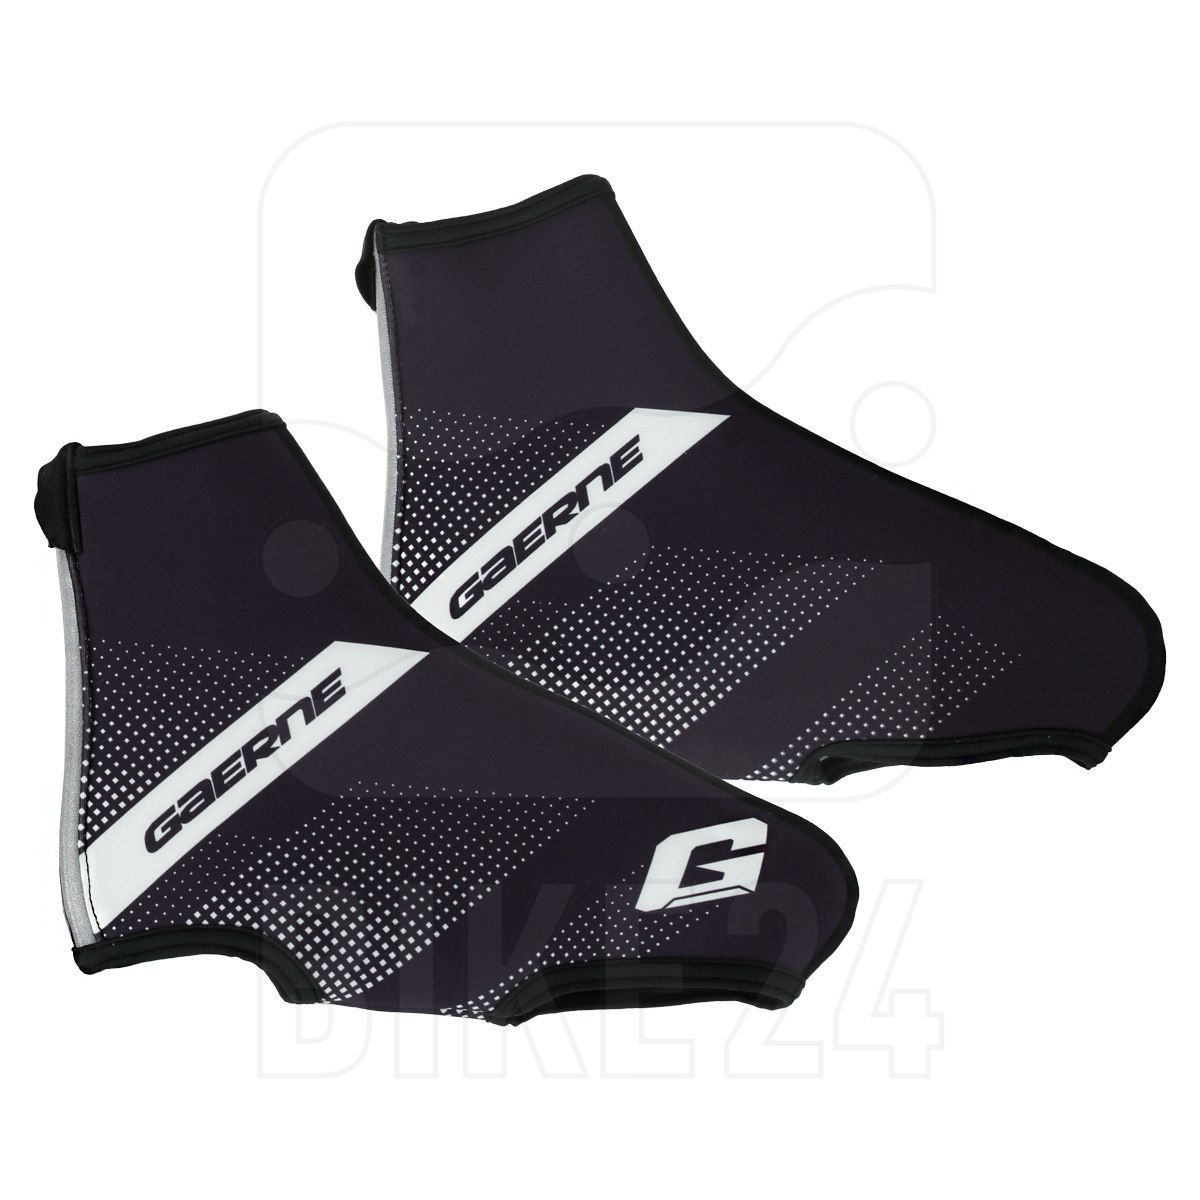 Gaerne G.ANTARCTIC Shoe Cover - Black/White